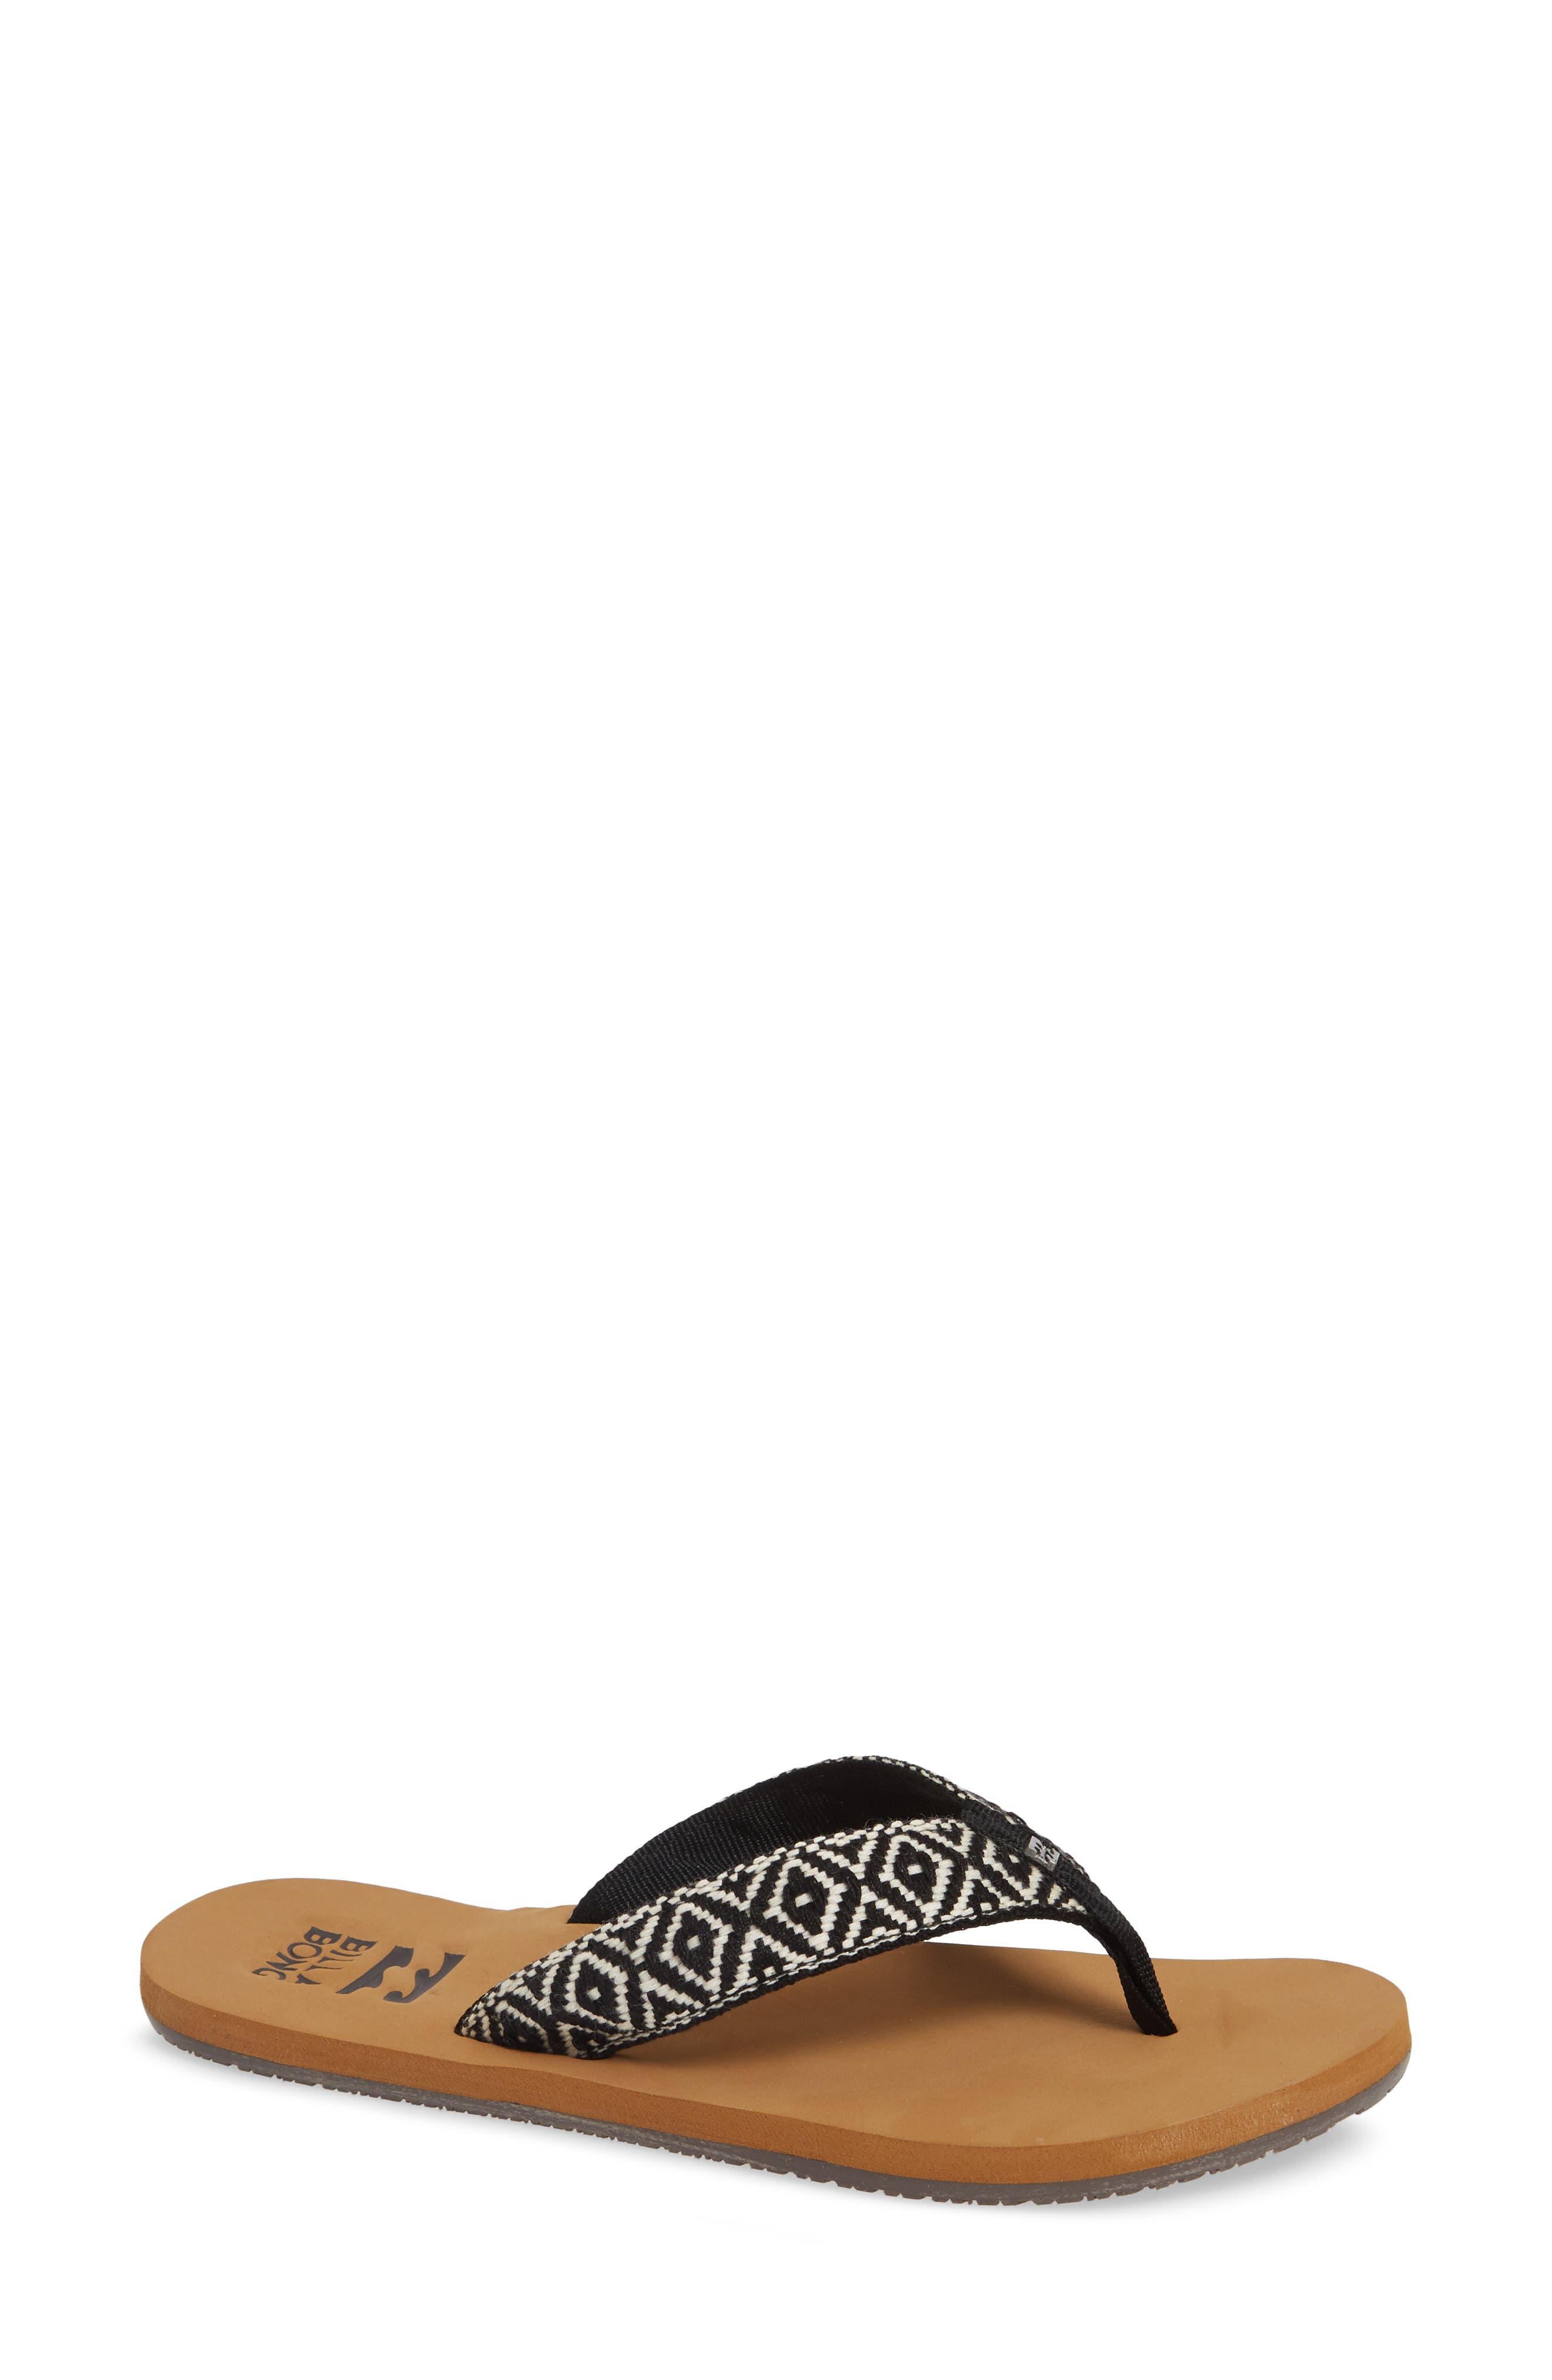 Baja Flip Flop,                             Main thumbnail 1, color,                             BLACK/ WHITE